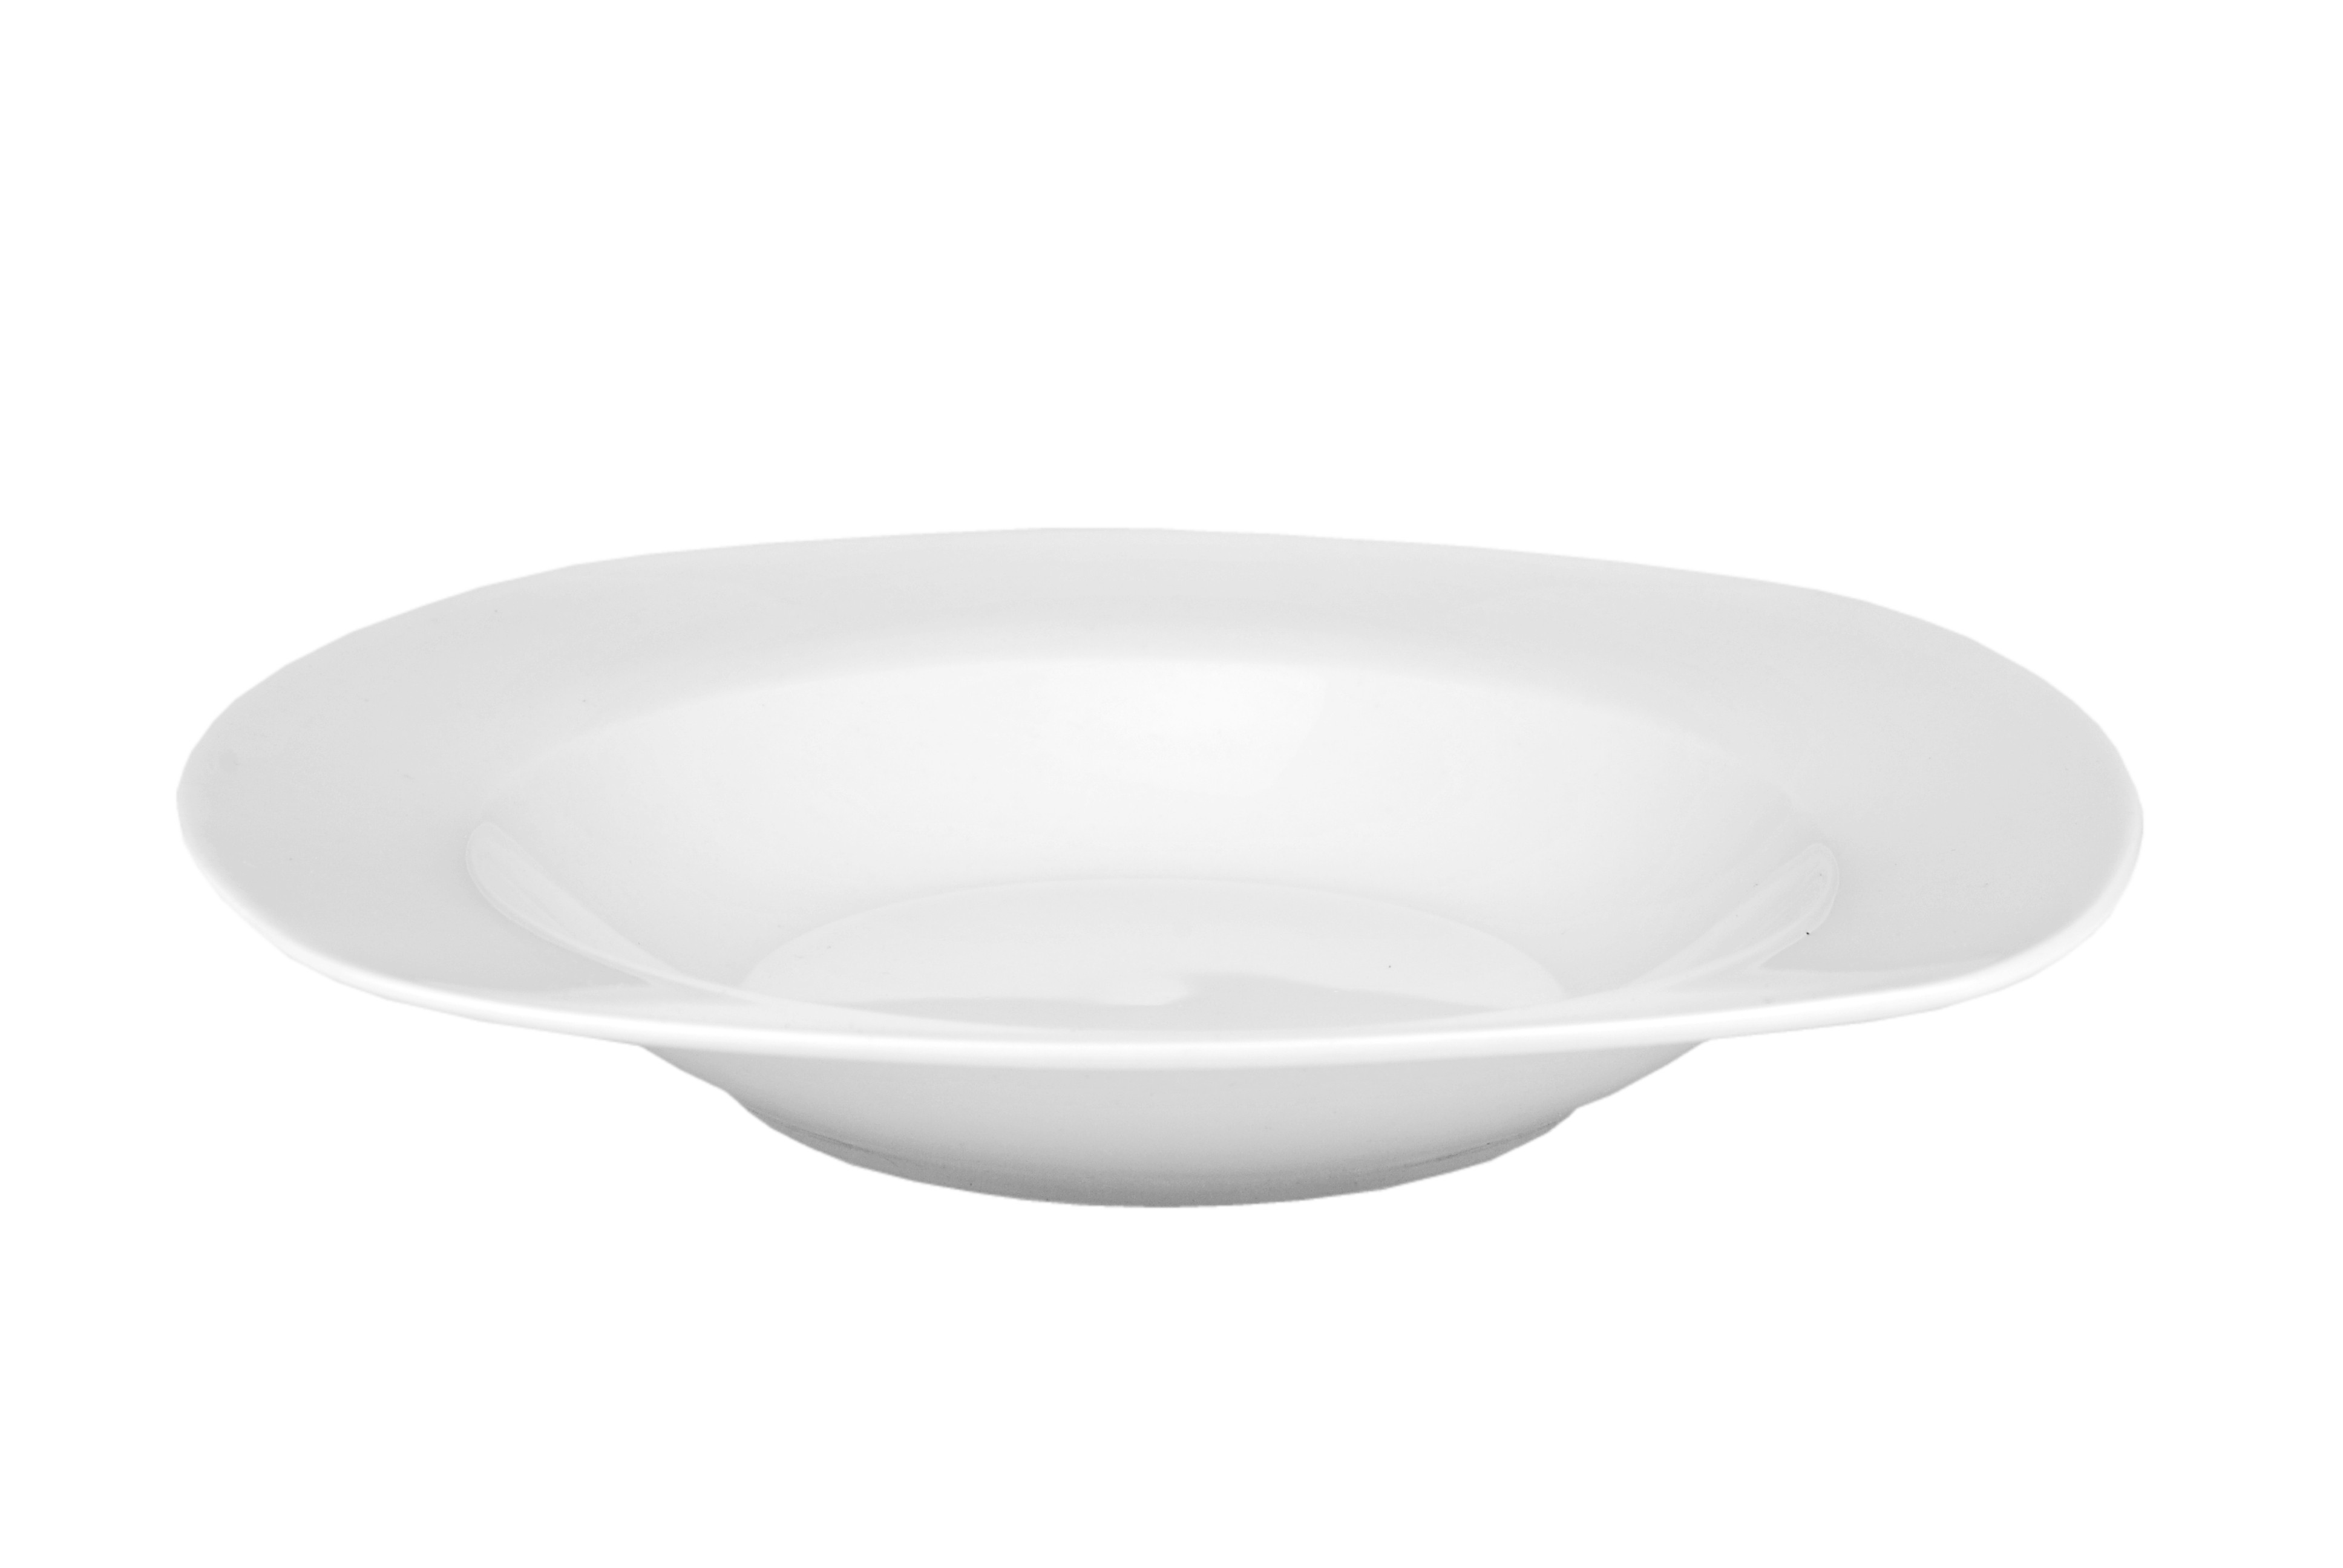 tafelservice premium 12tlg f r 6 personen porzellan tafelservice ohne dekor. Black Bedroom Furniture Sets. Home Design Ideas